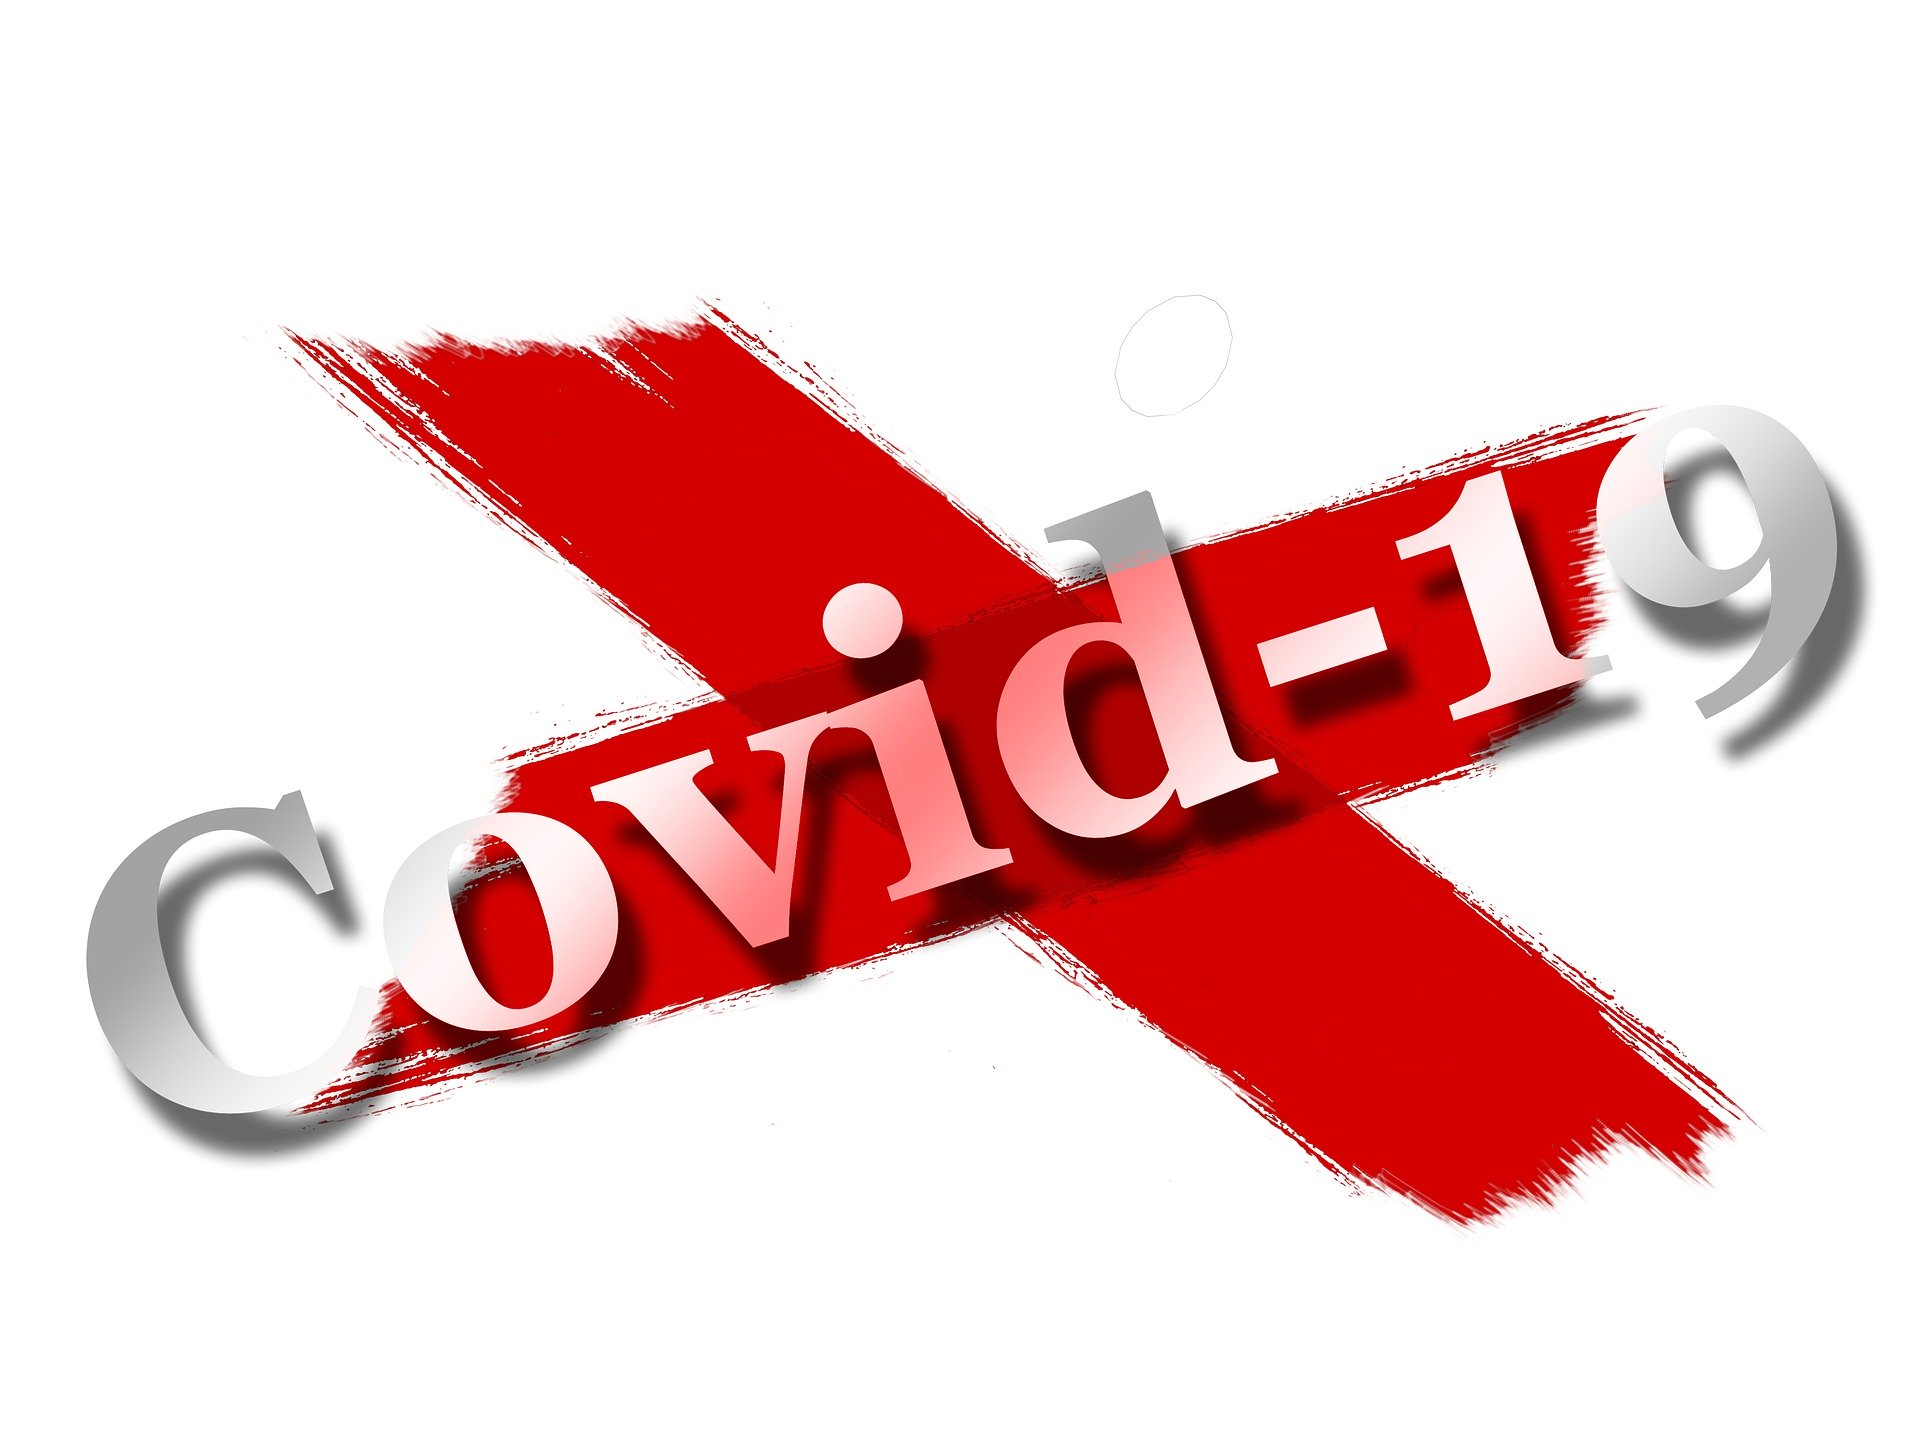 Quelle https://pixabay.com/de/illustrations/covid-19-coronavirus-sars-cov-2-4908691/